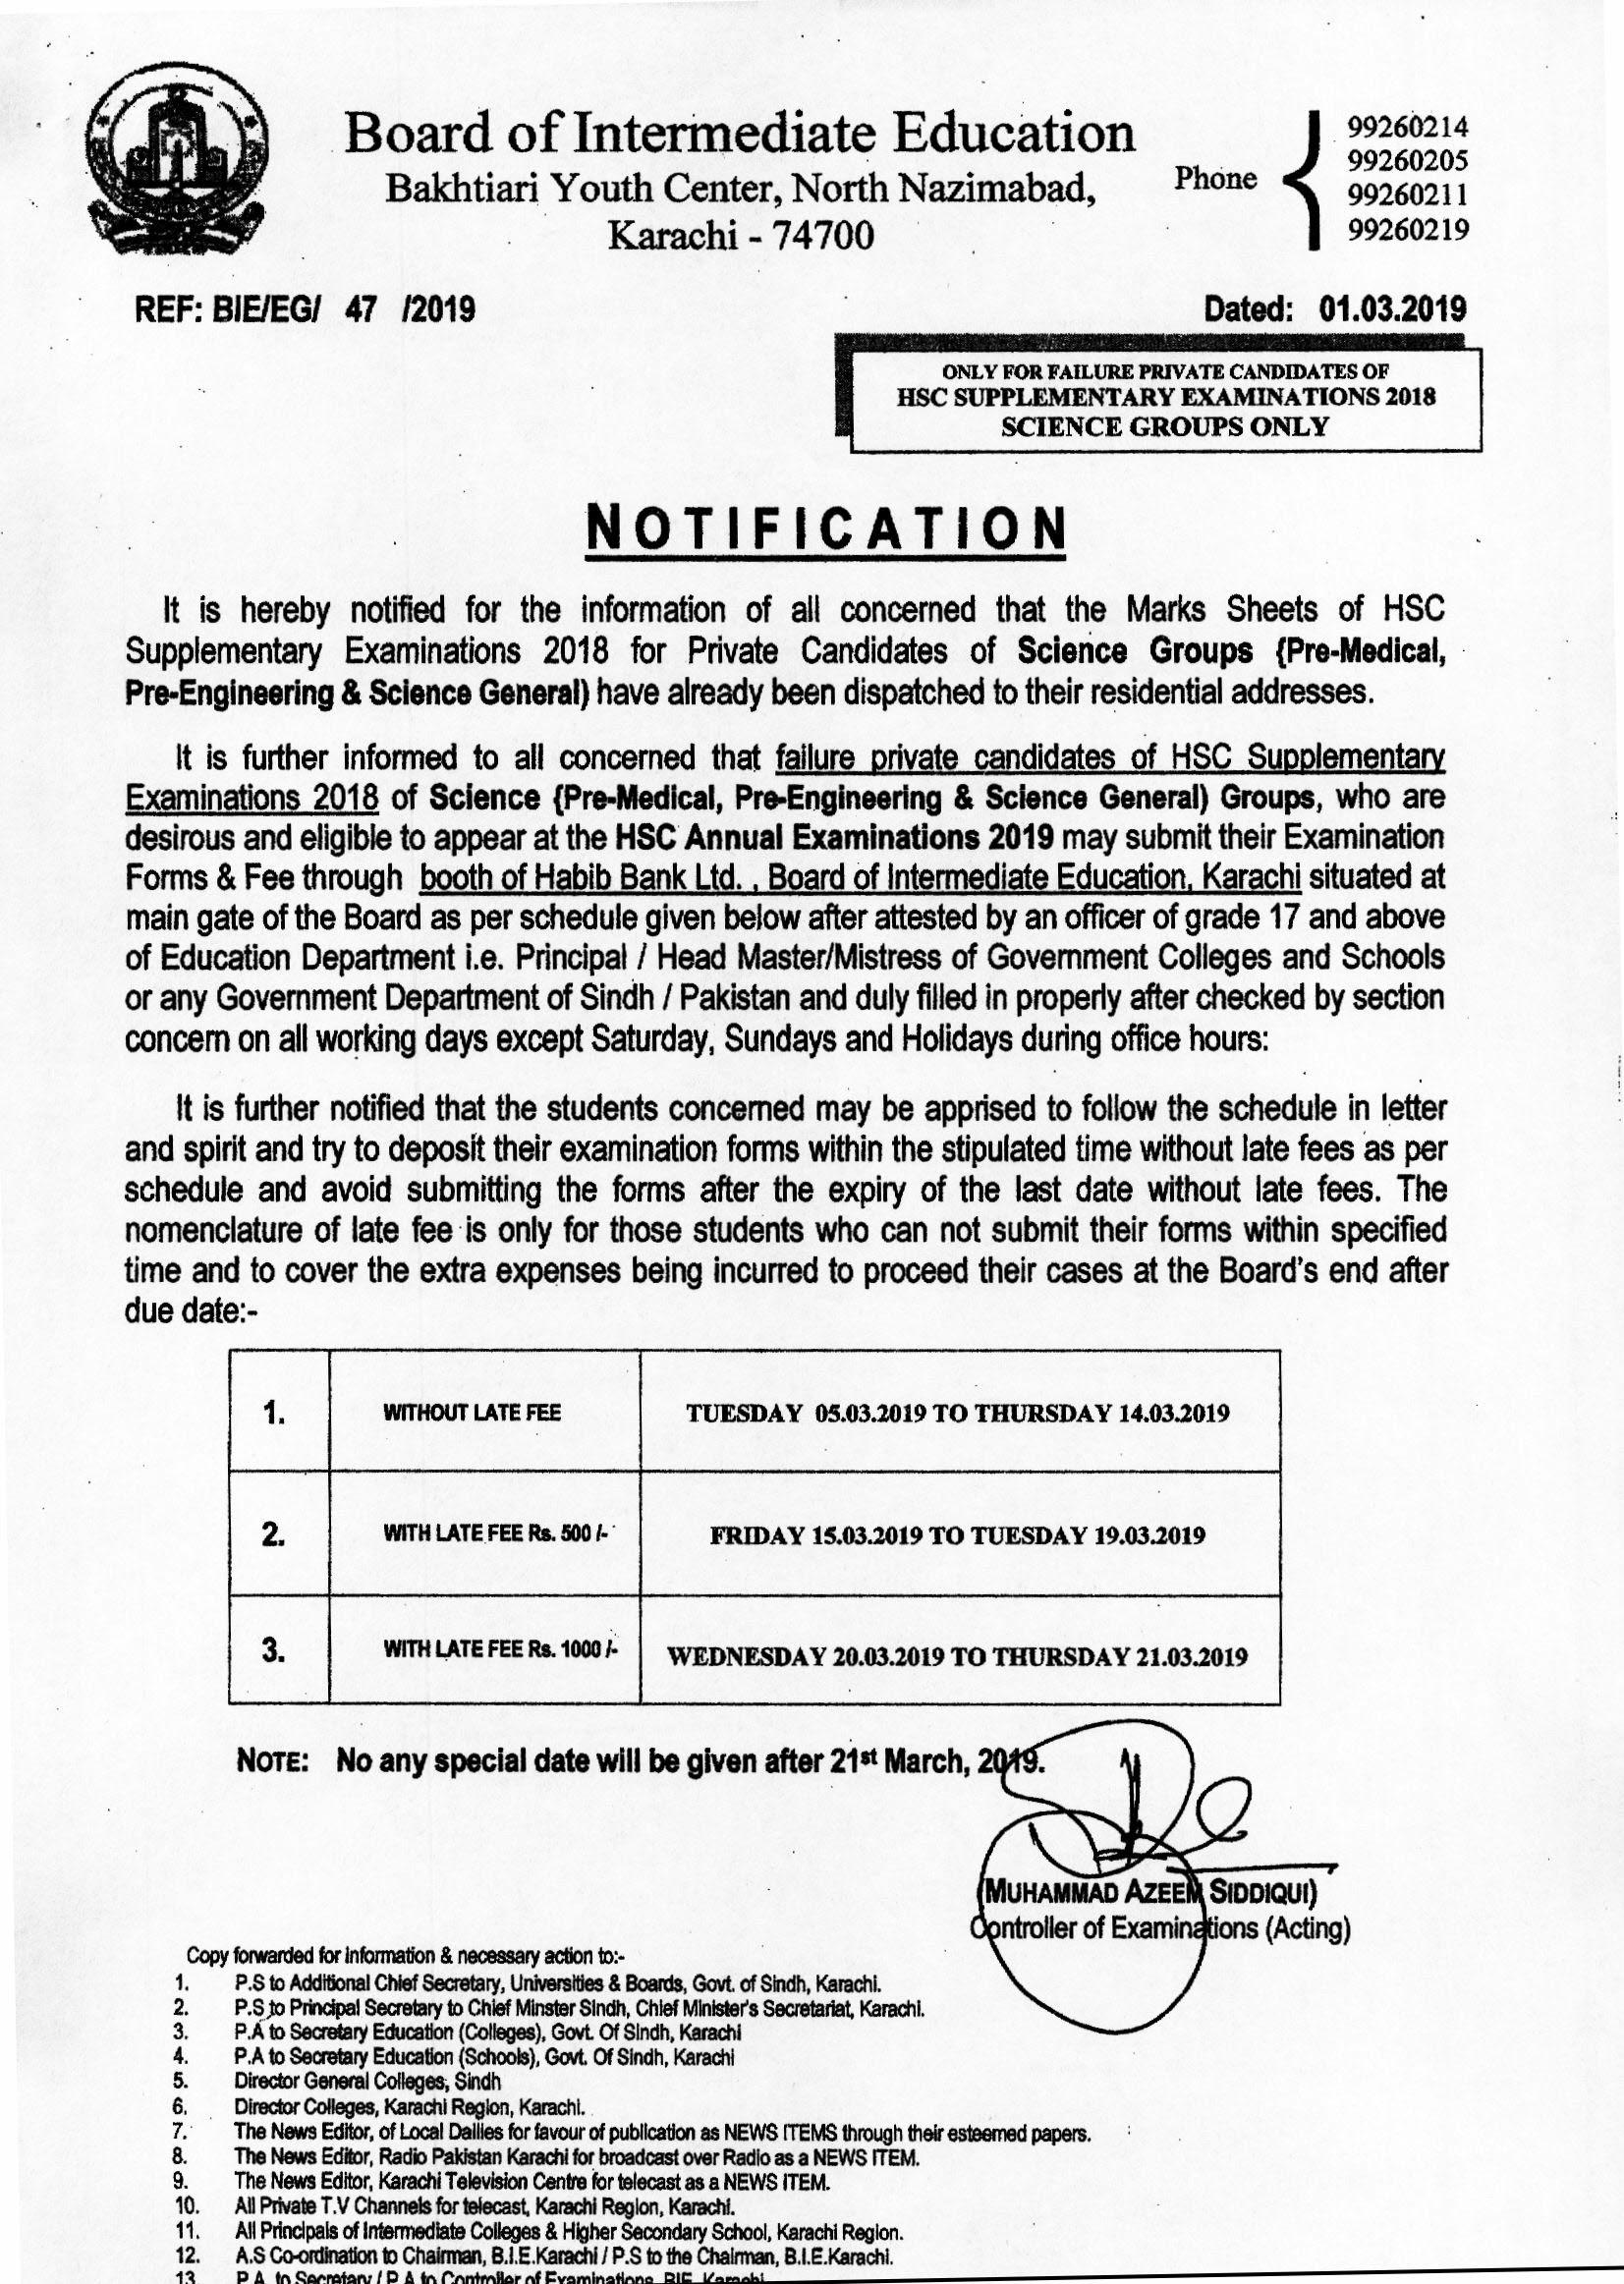 Welcome to Board of Intermediate Education Karachi